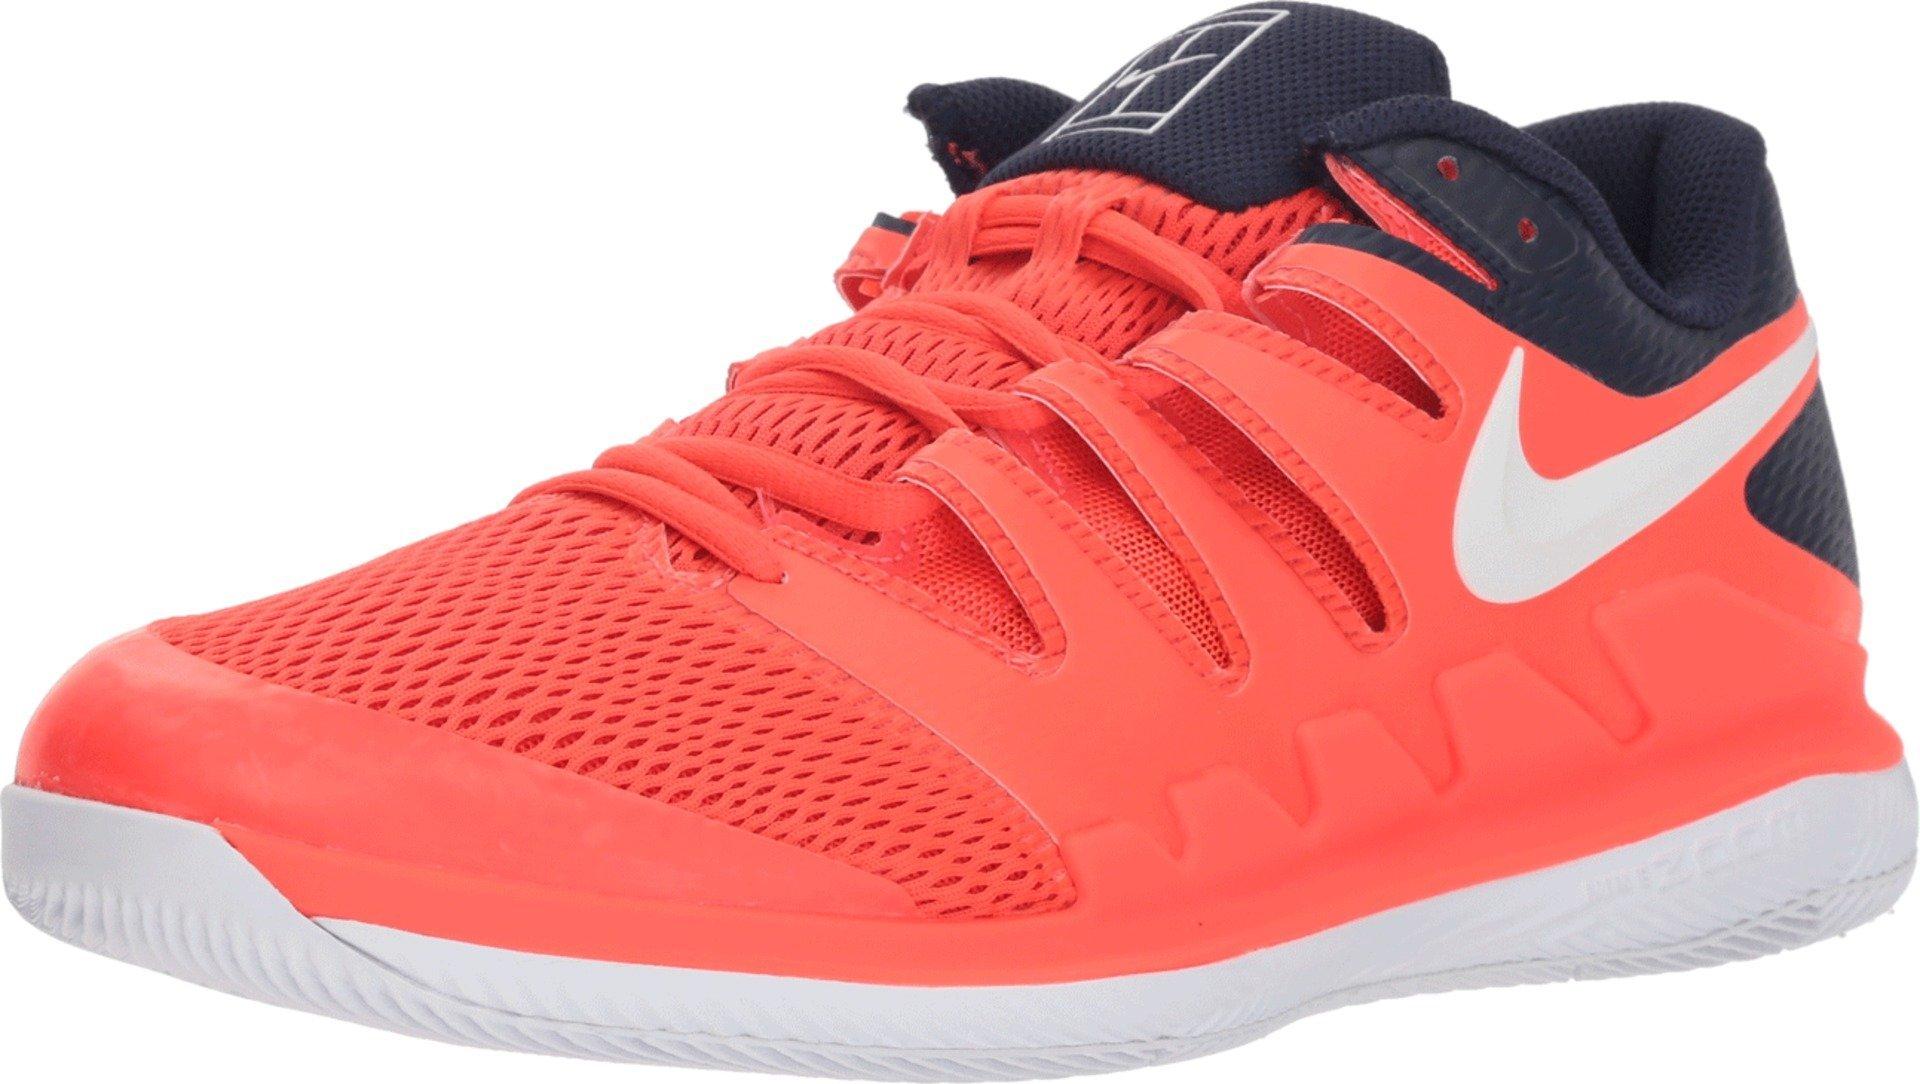 fb505944df9a8 Nike Men's Zoom Vapor X Tennis Shoes (12 D US, Bright  Crimson/White/Blackened Blue)